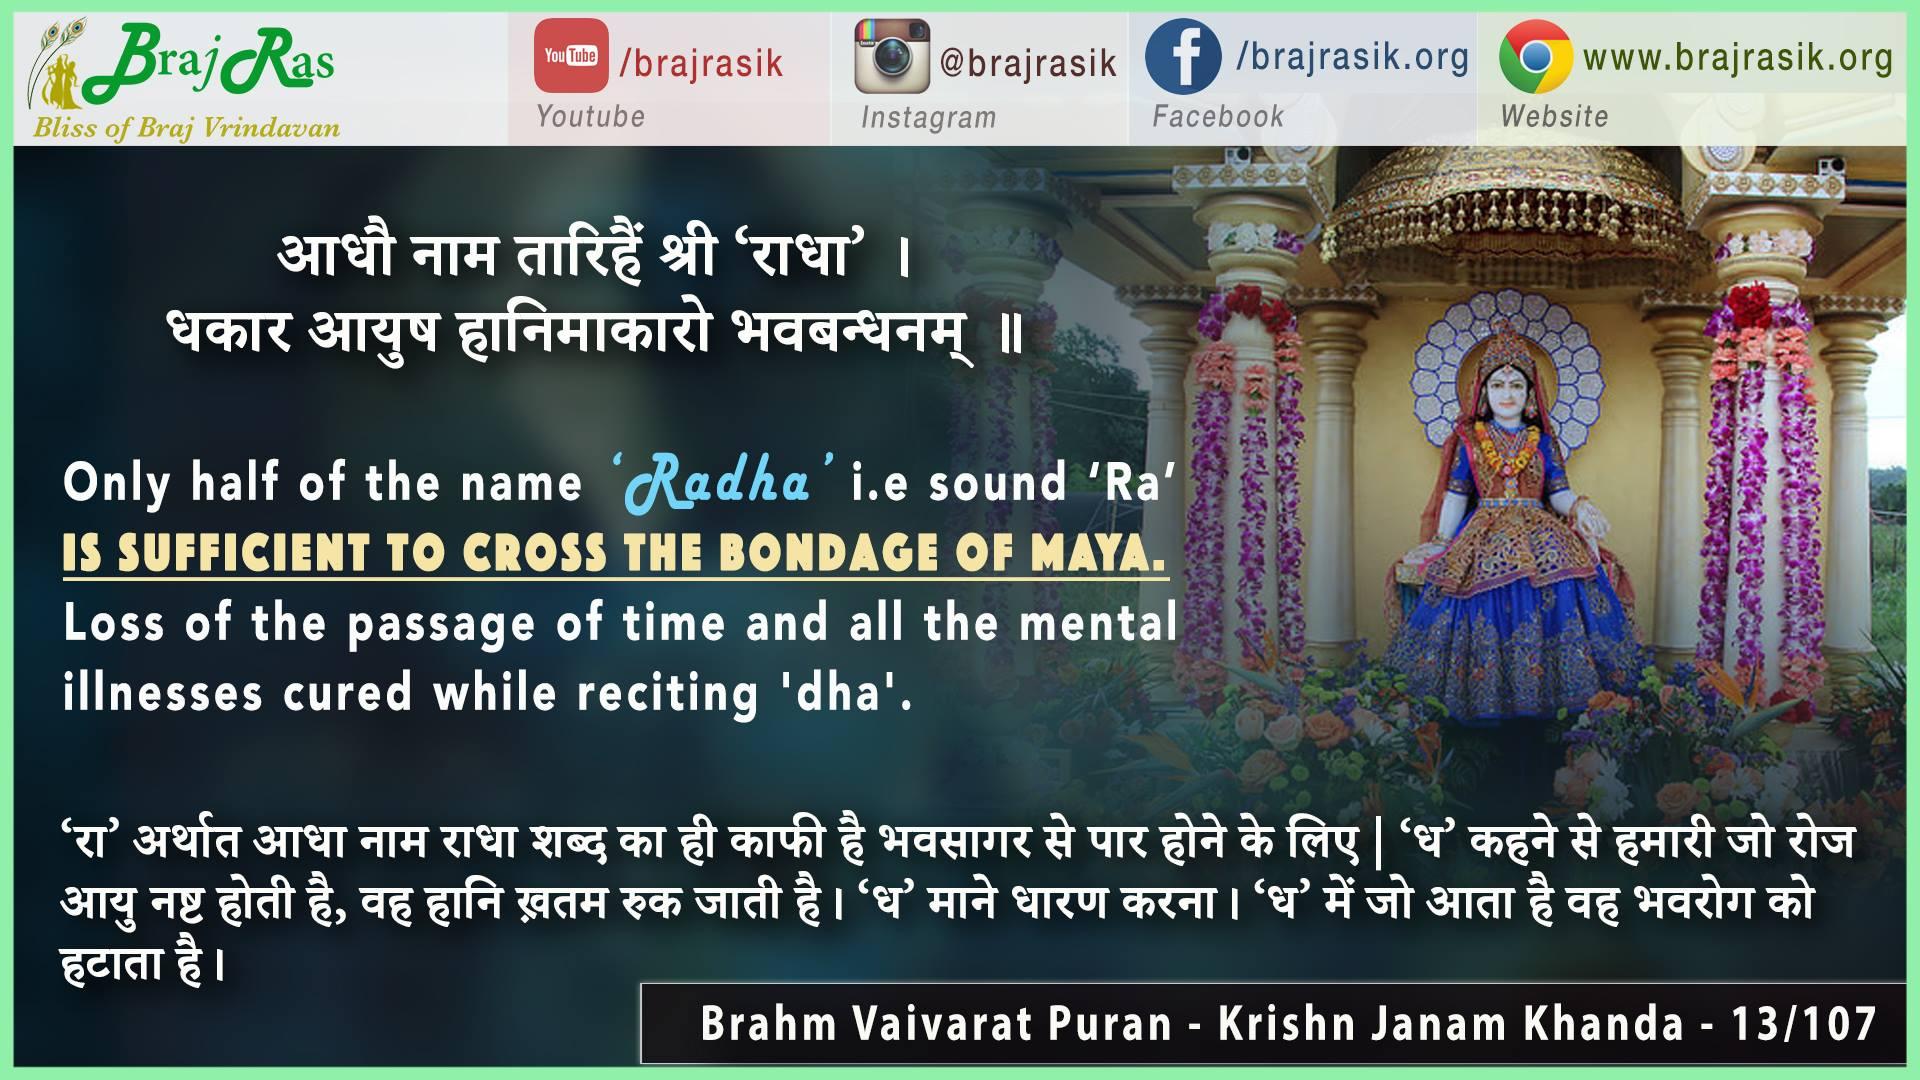 Aadho Naam Tarihain Shri Radha - Brahm Vaivarat Puran